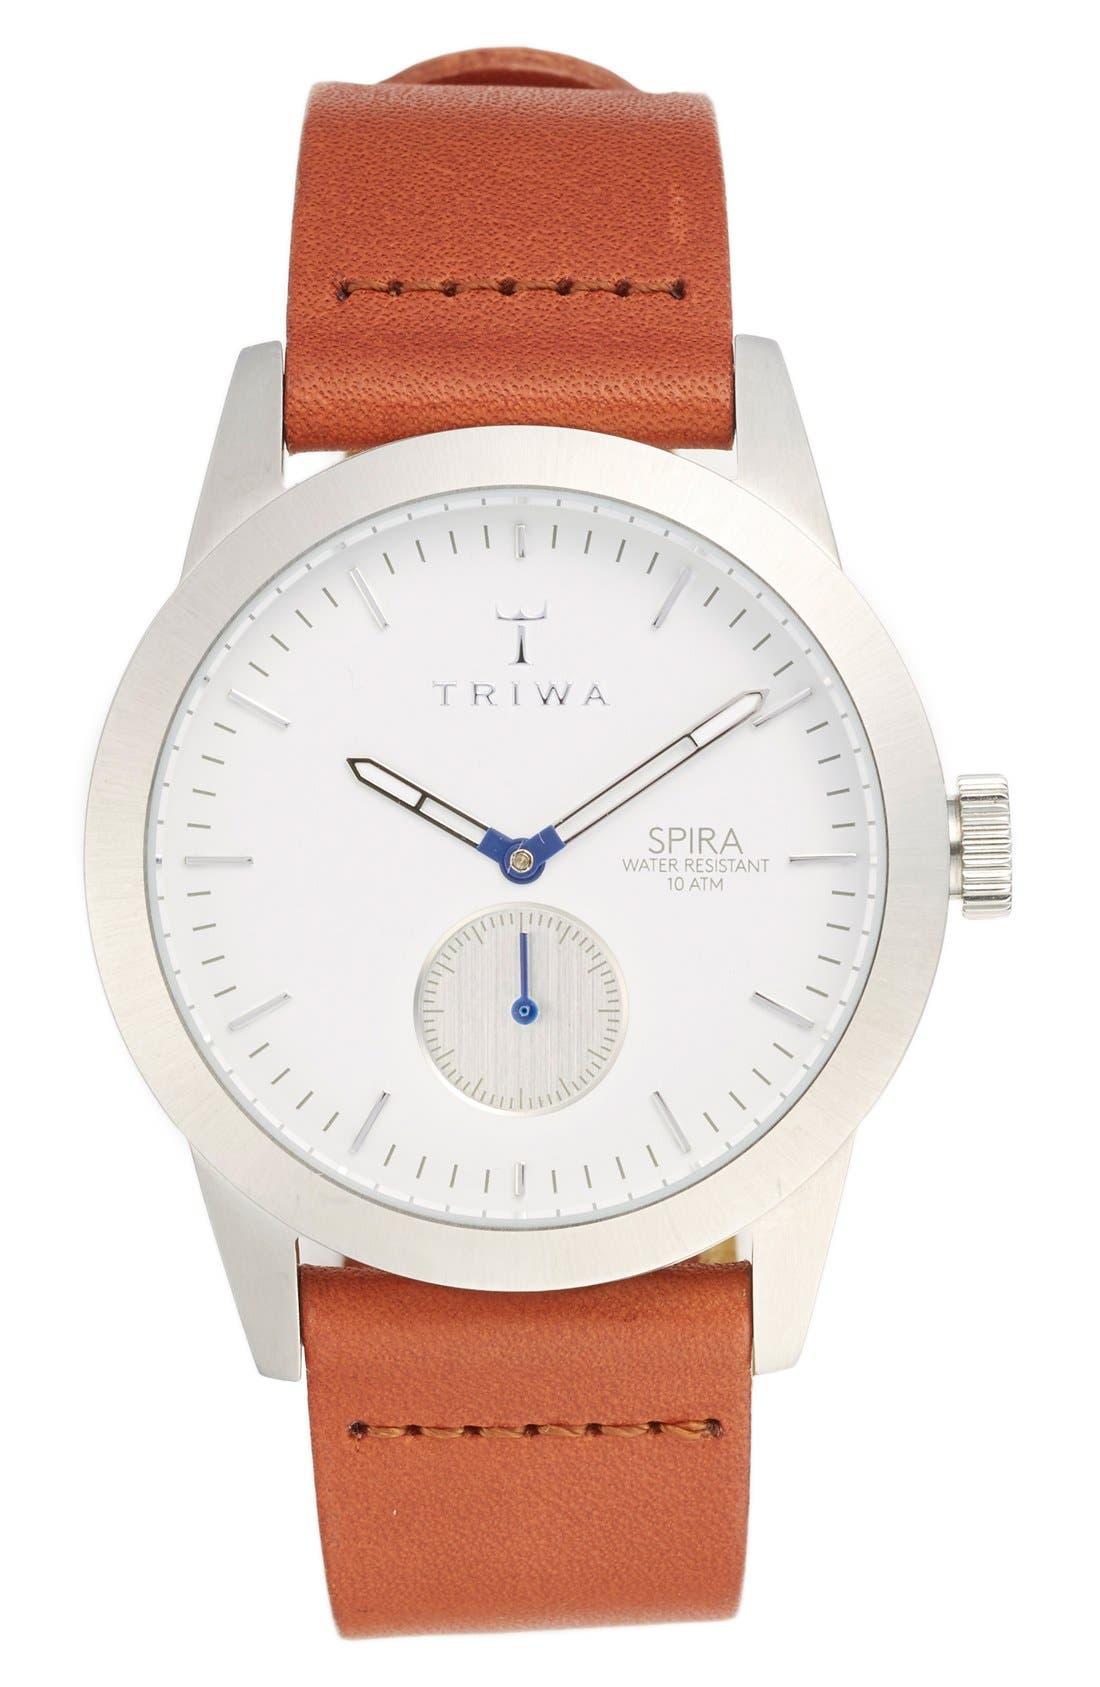 Main Image - TRIWA Spira Leather Strap Watch, 38mm